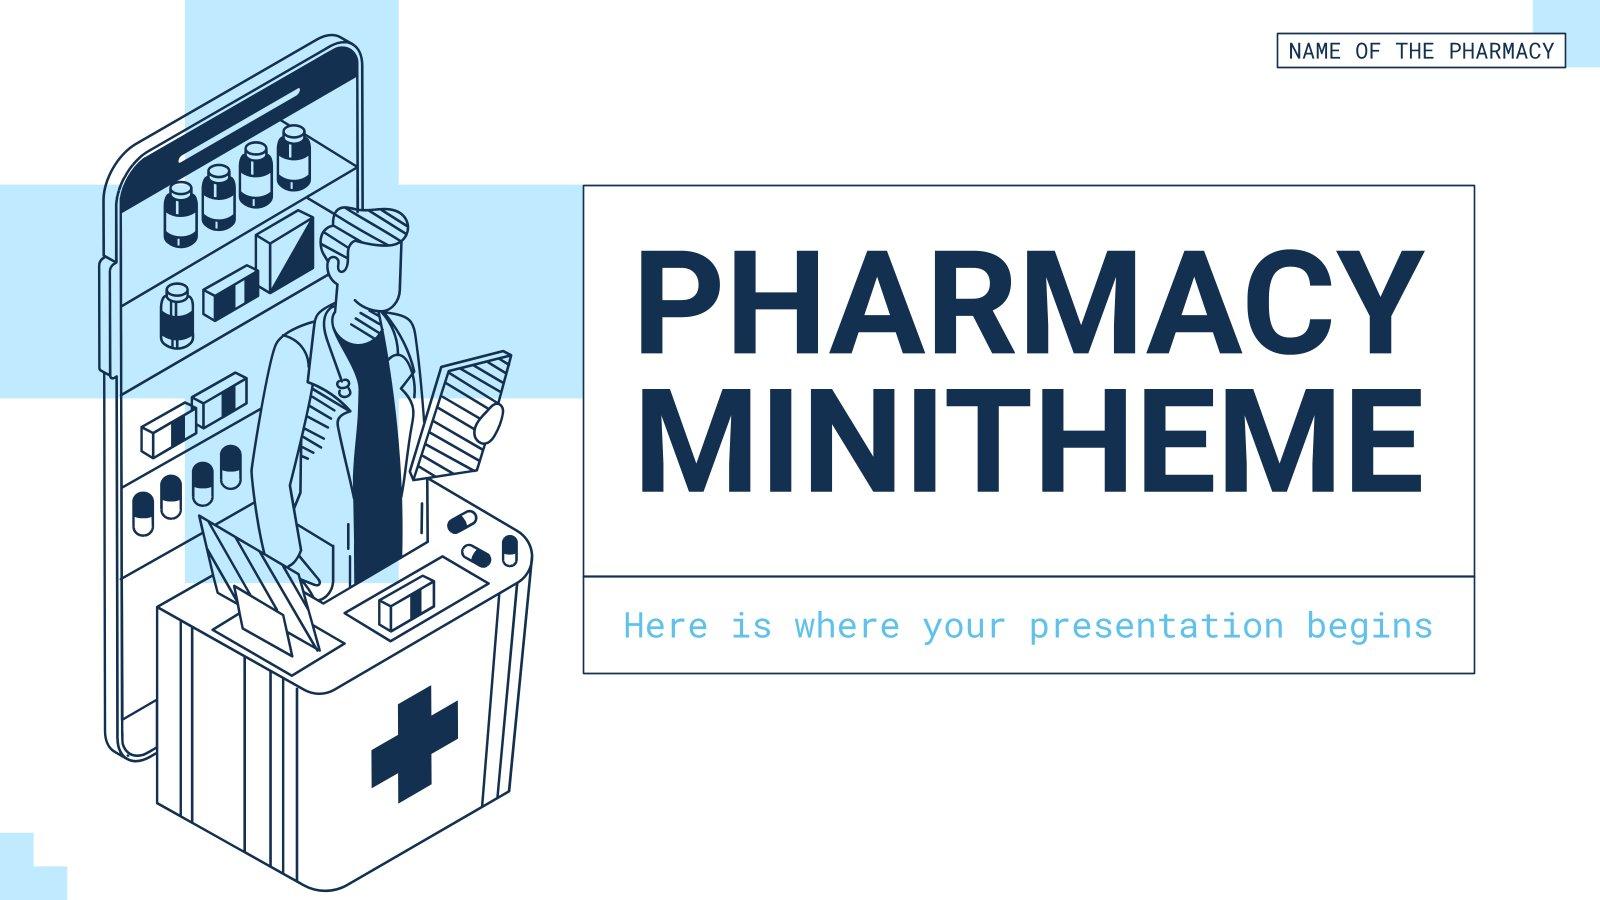 Pharmacy Minitheme presentation template